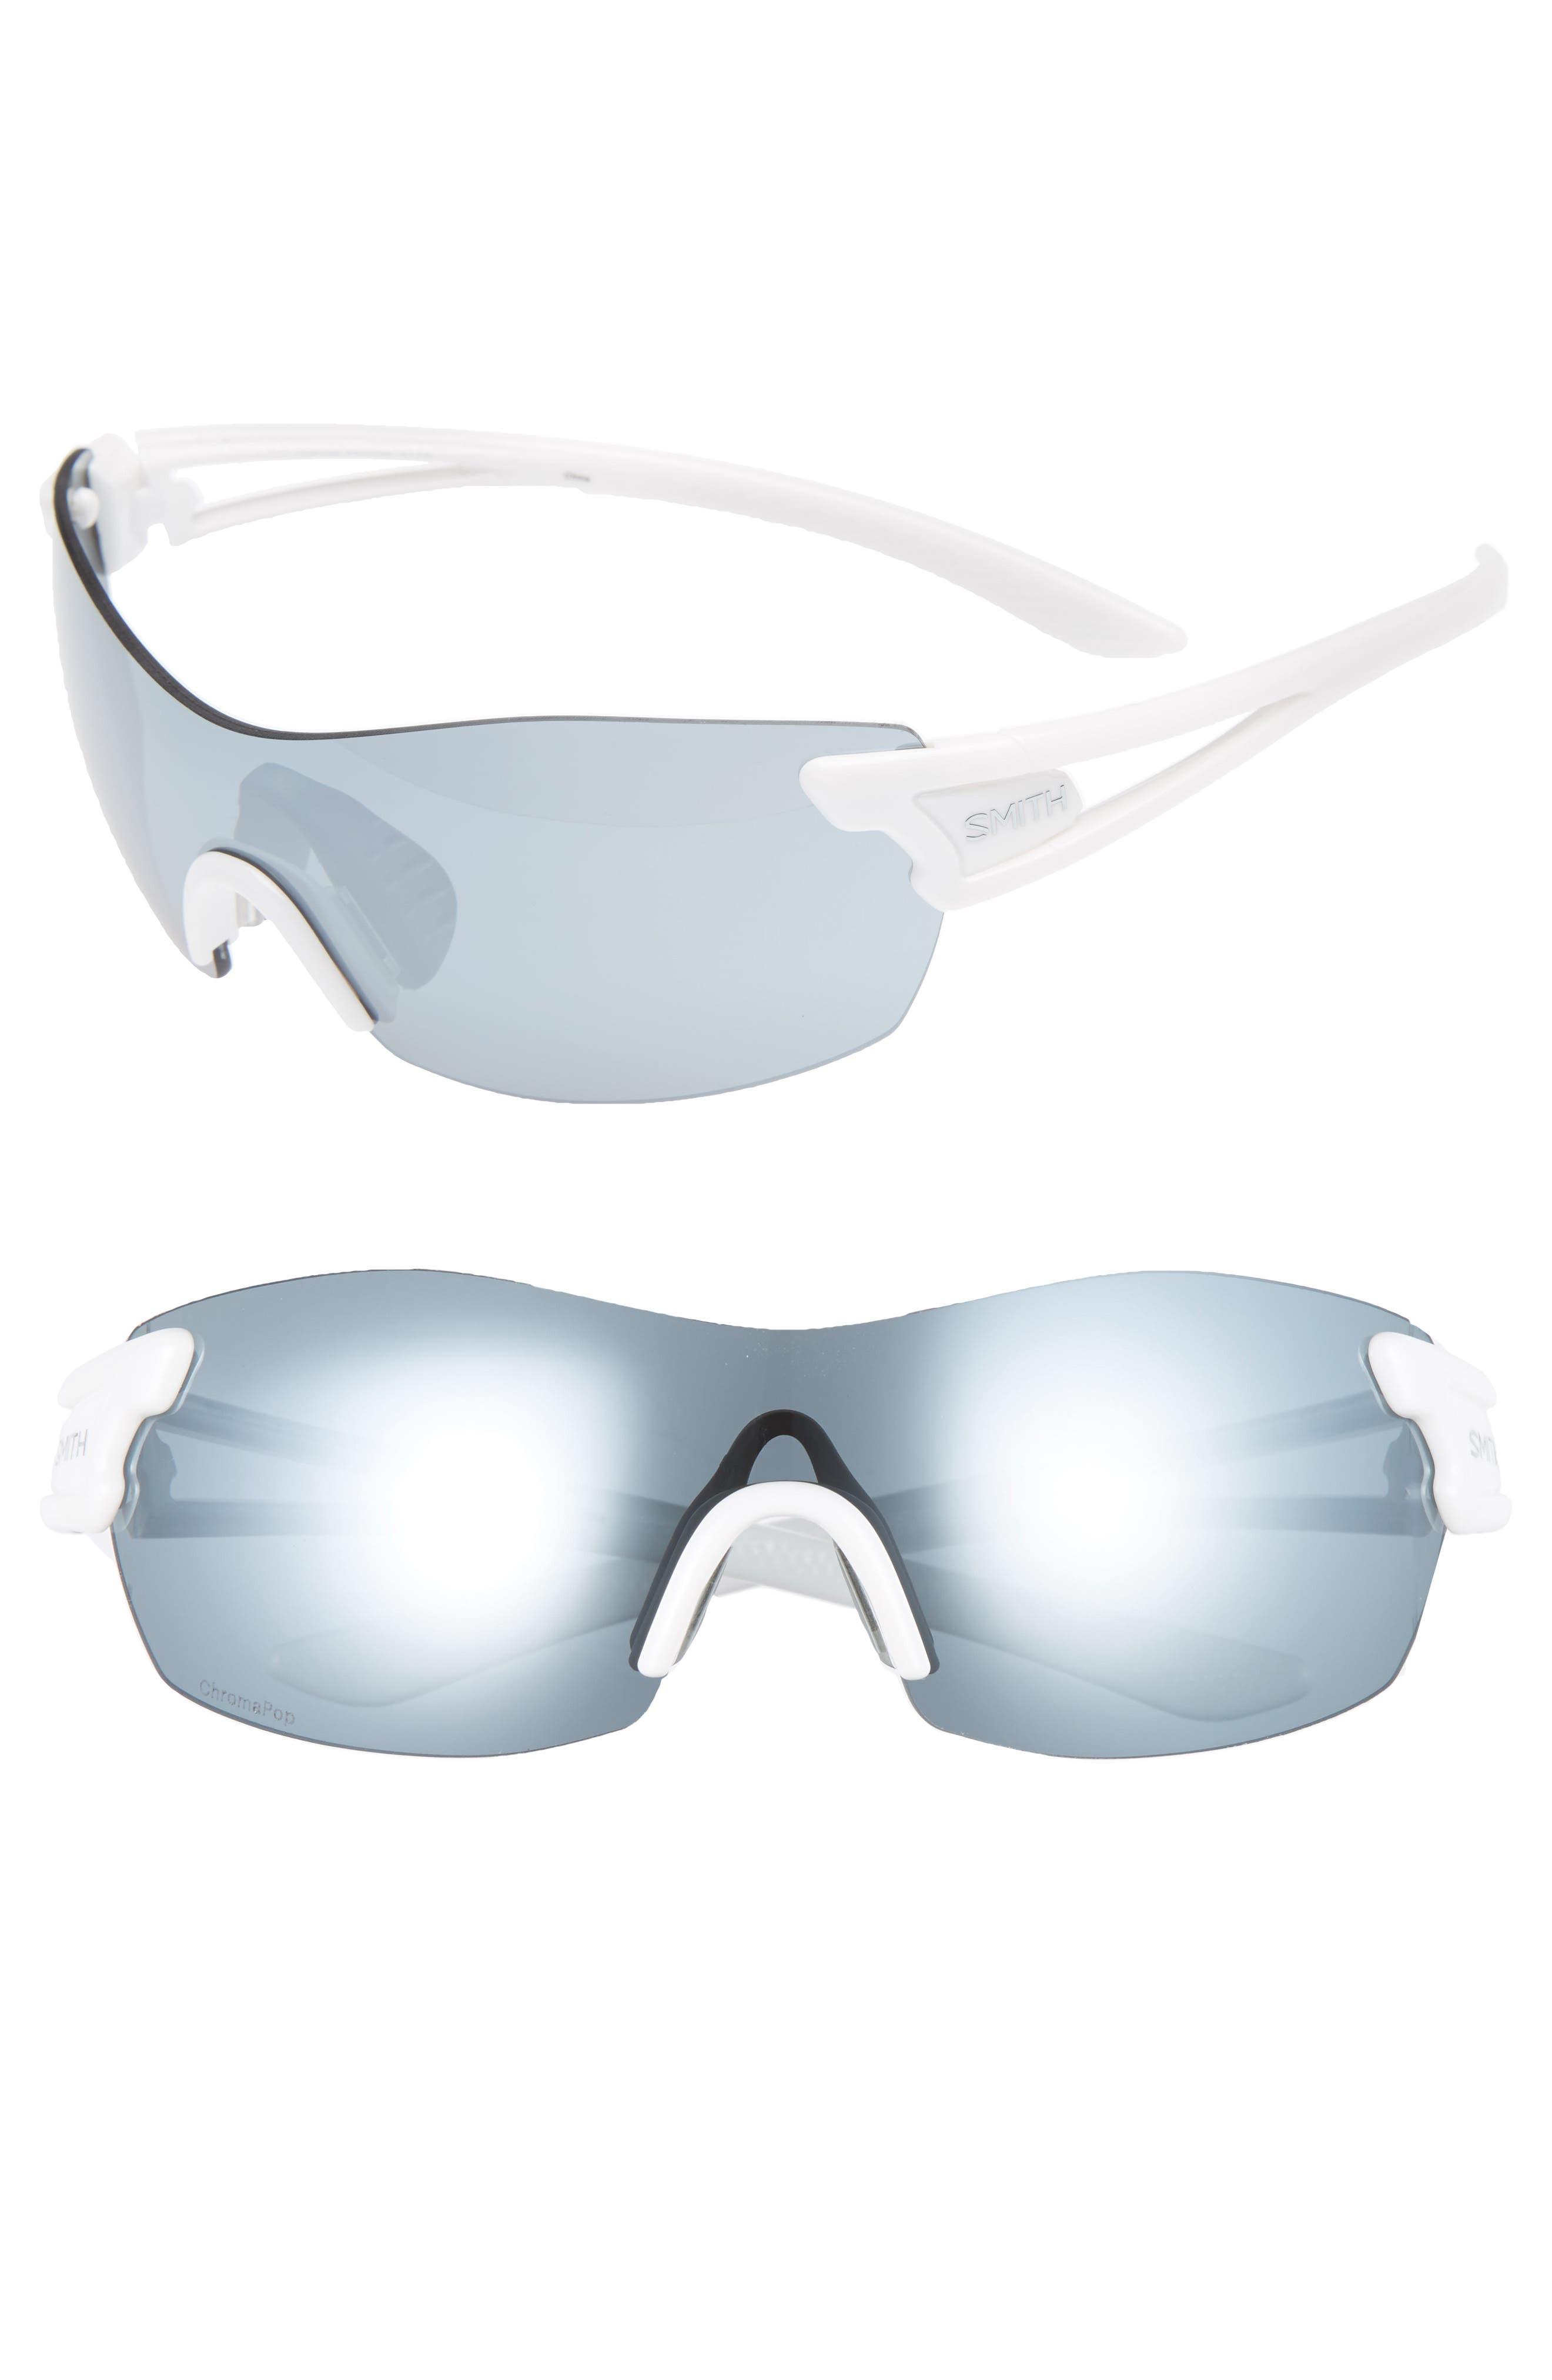 PivLock<sup>™</sup> Asana 150mm ChromaPop Polarized Sunglasses,                             Alternate thumbnail 7, color,